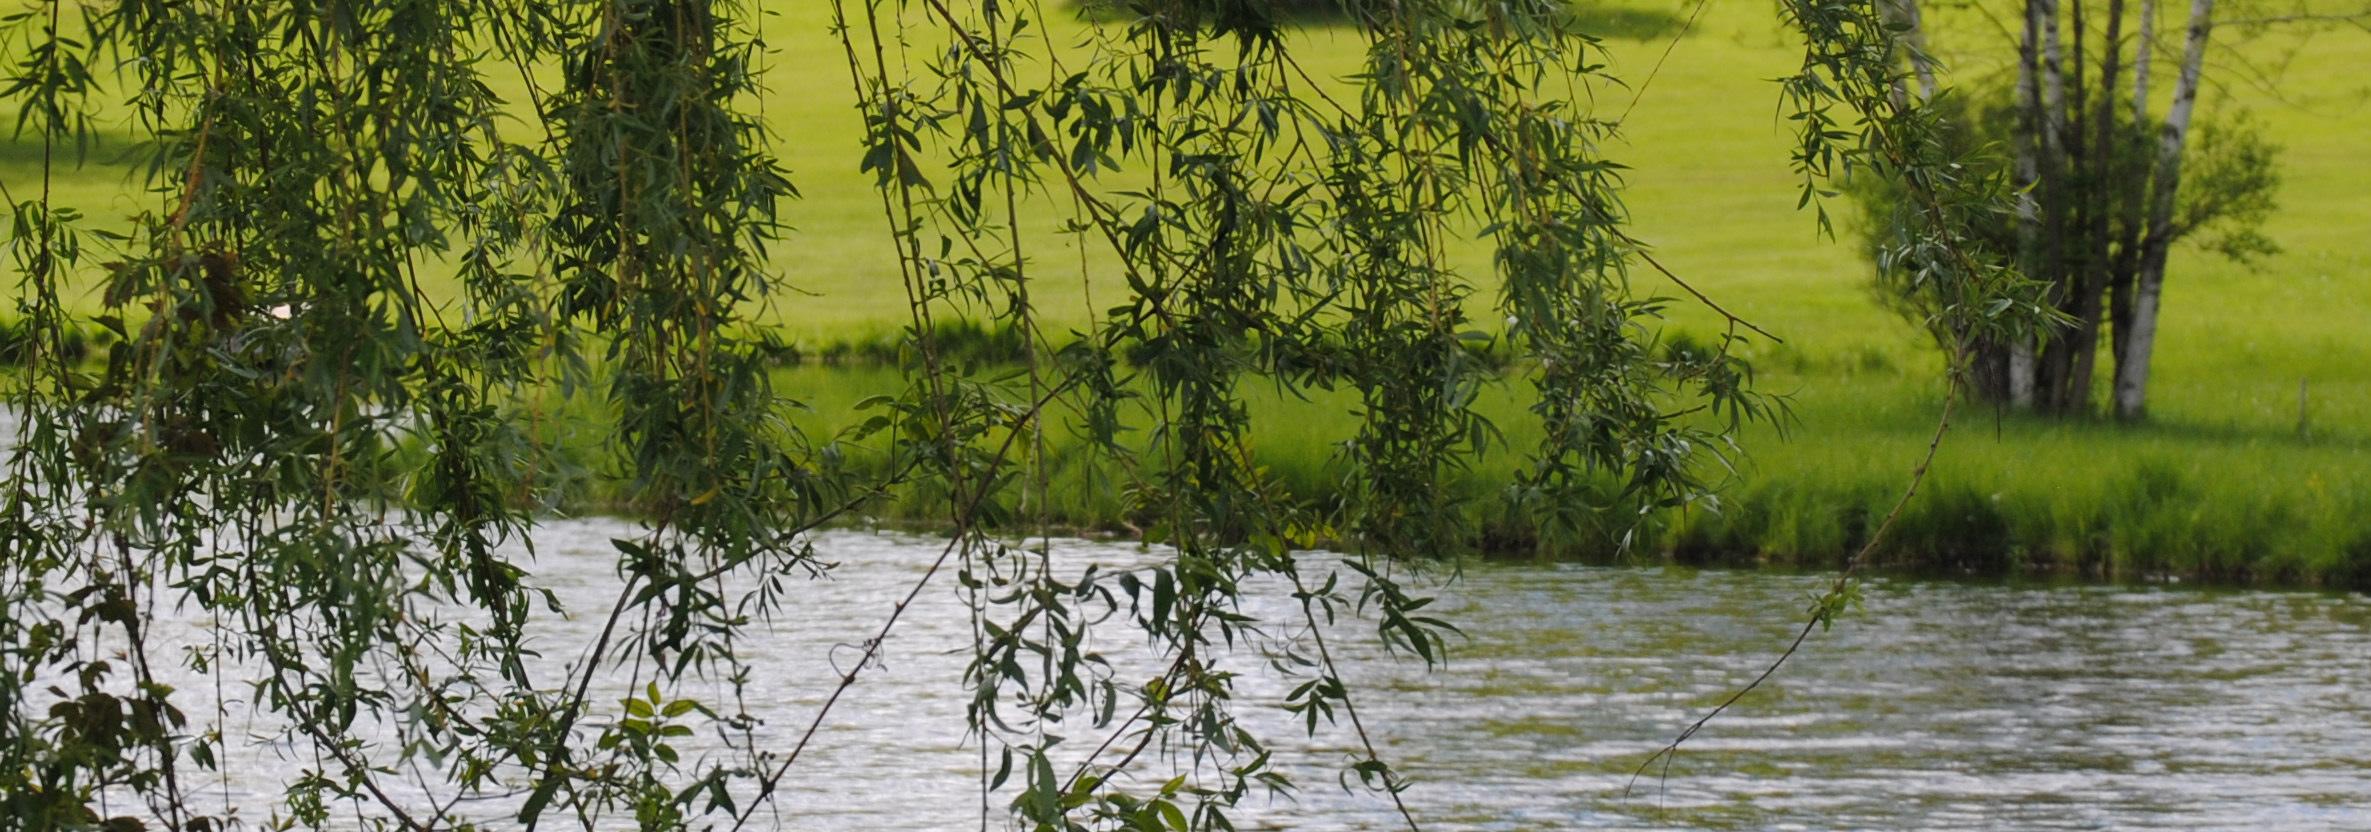 Michigan oakland county highland -  Highland Township Pond Jpg